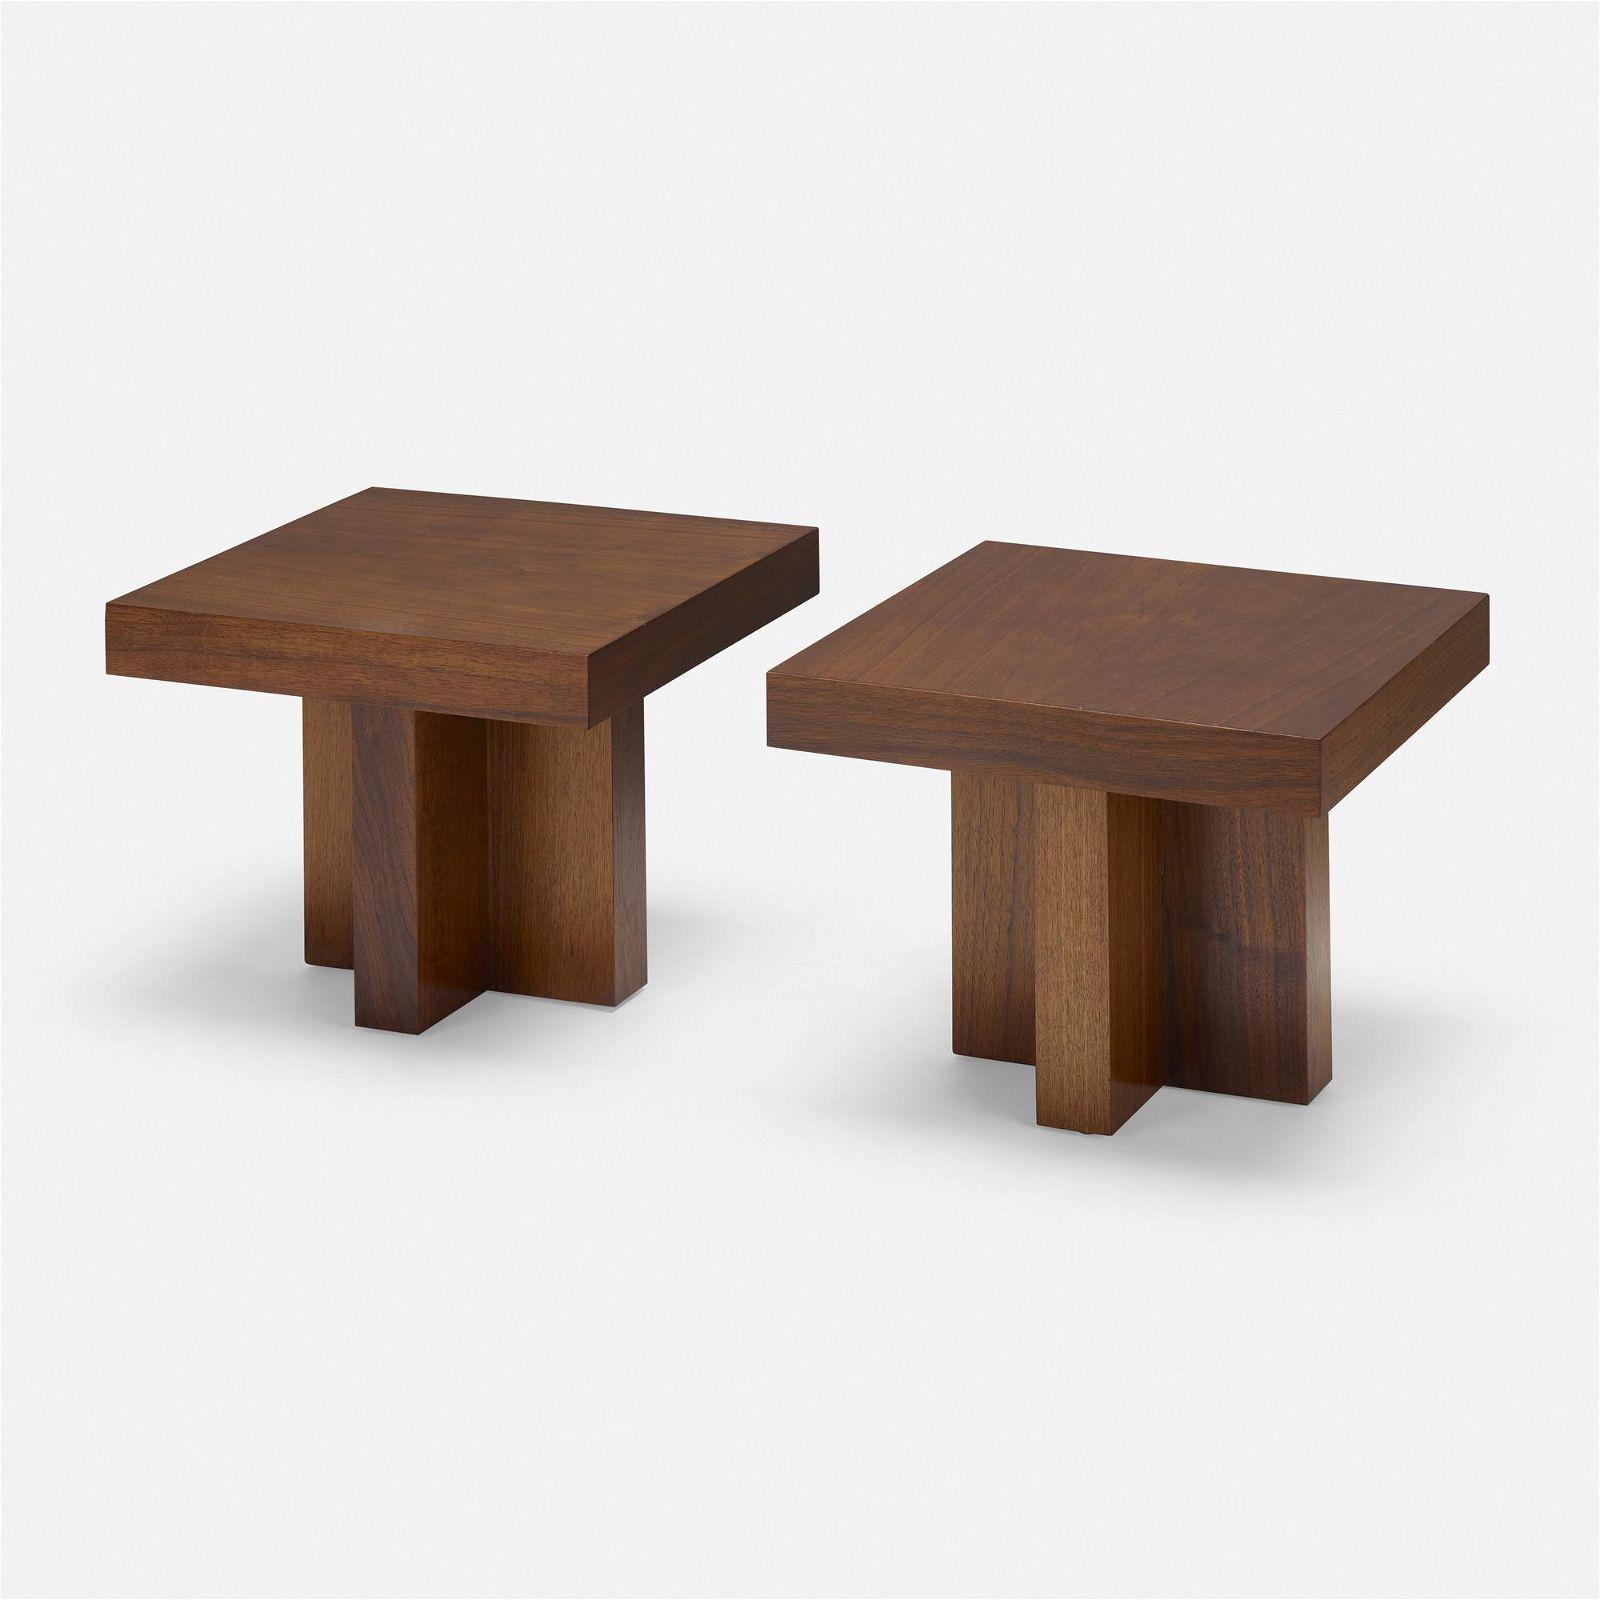 Milo Baughman, Occasional tables, pair